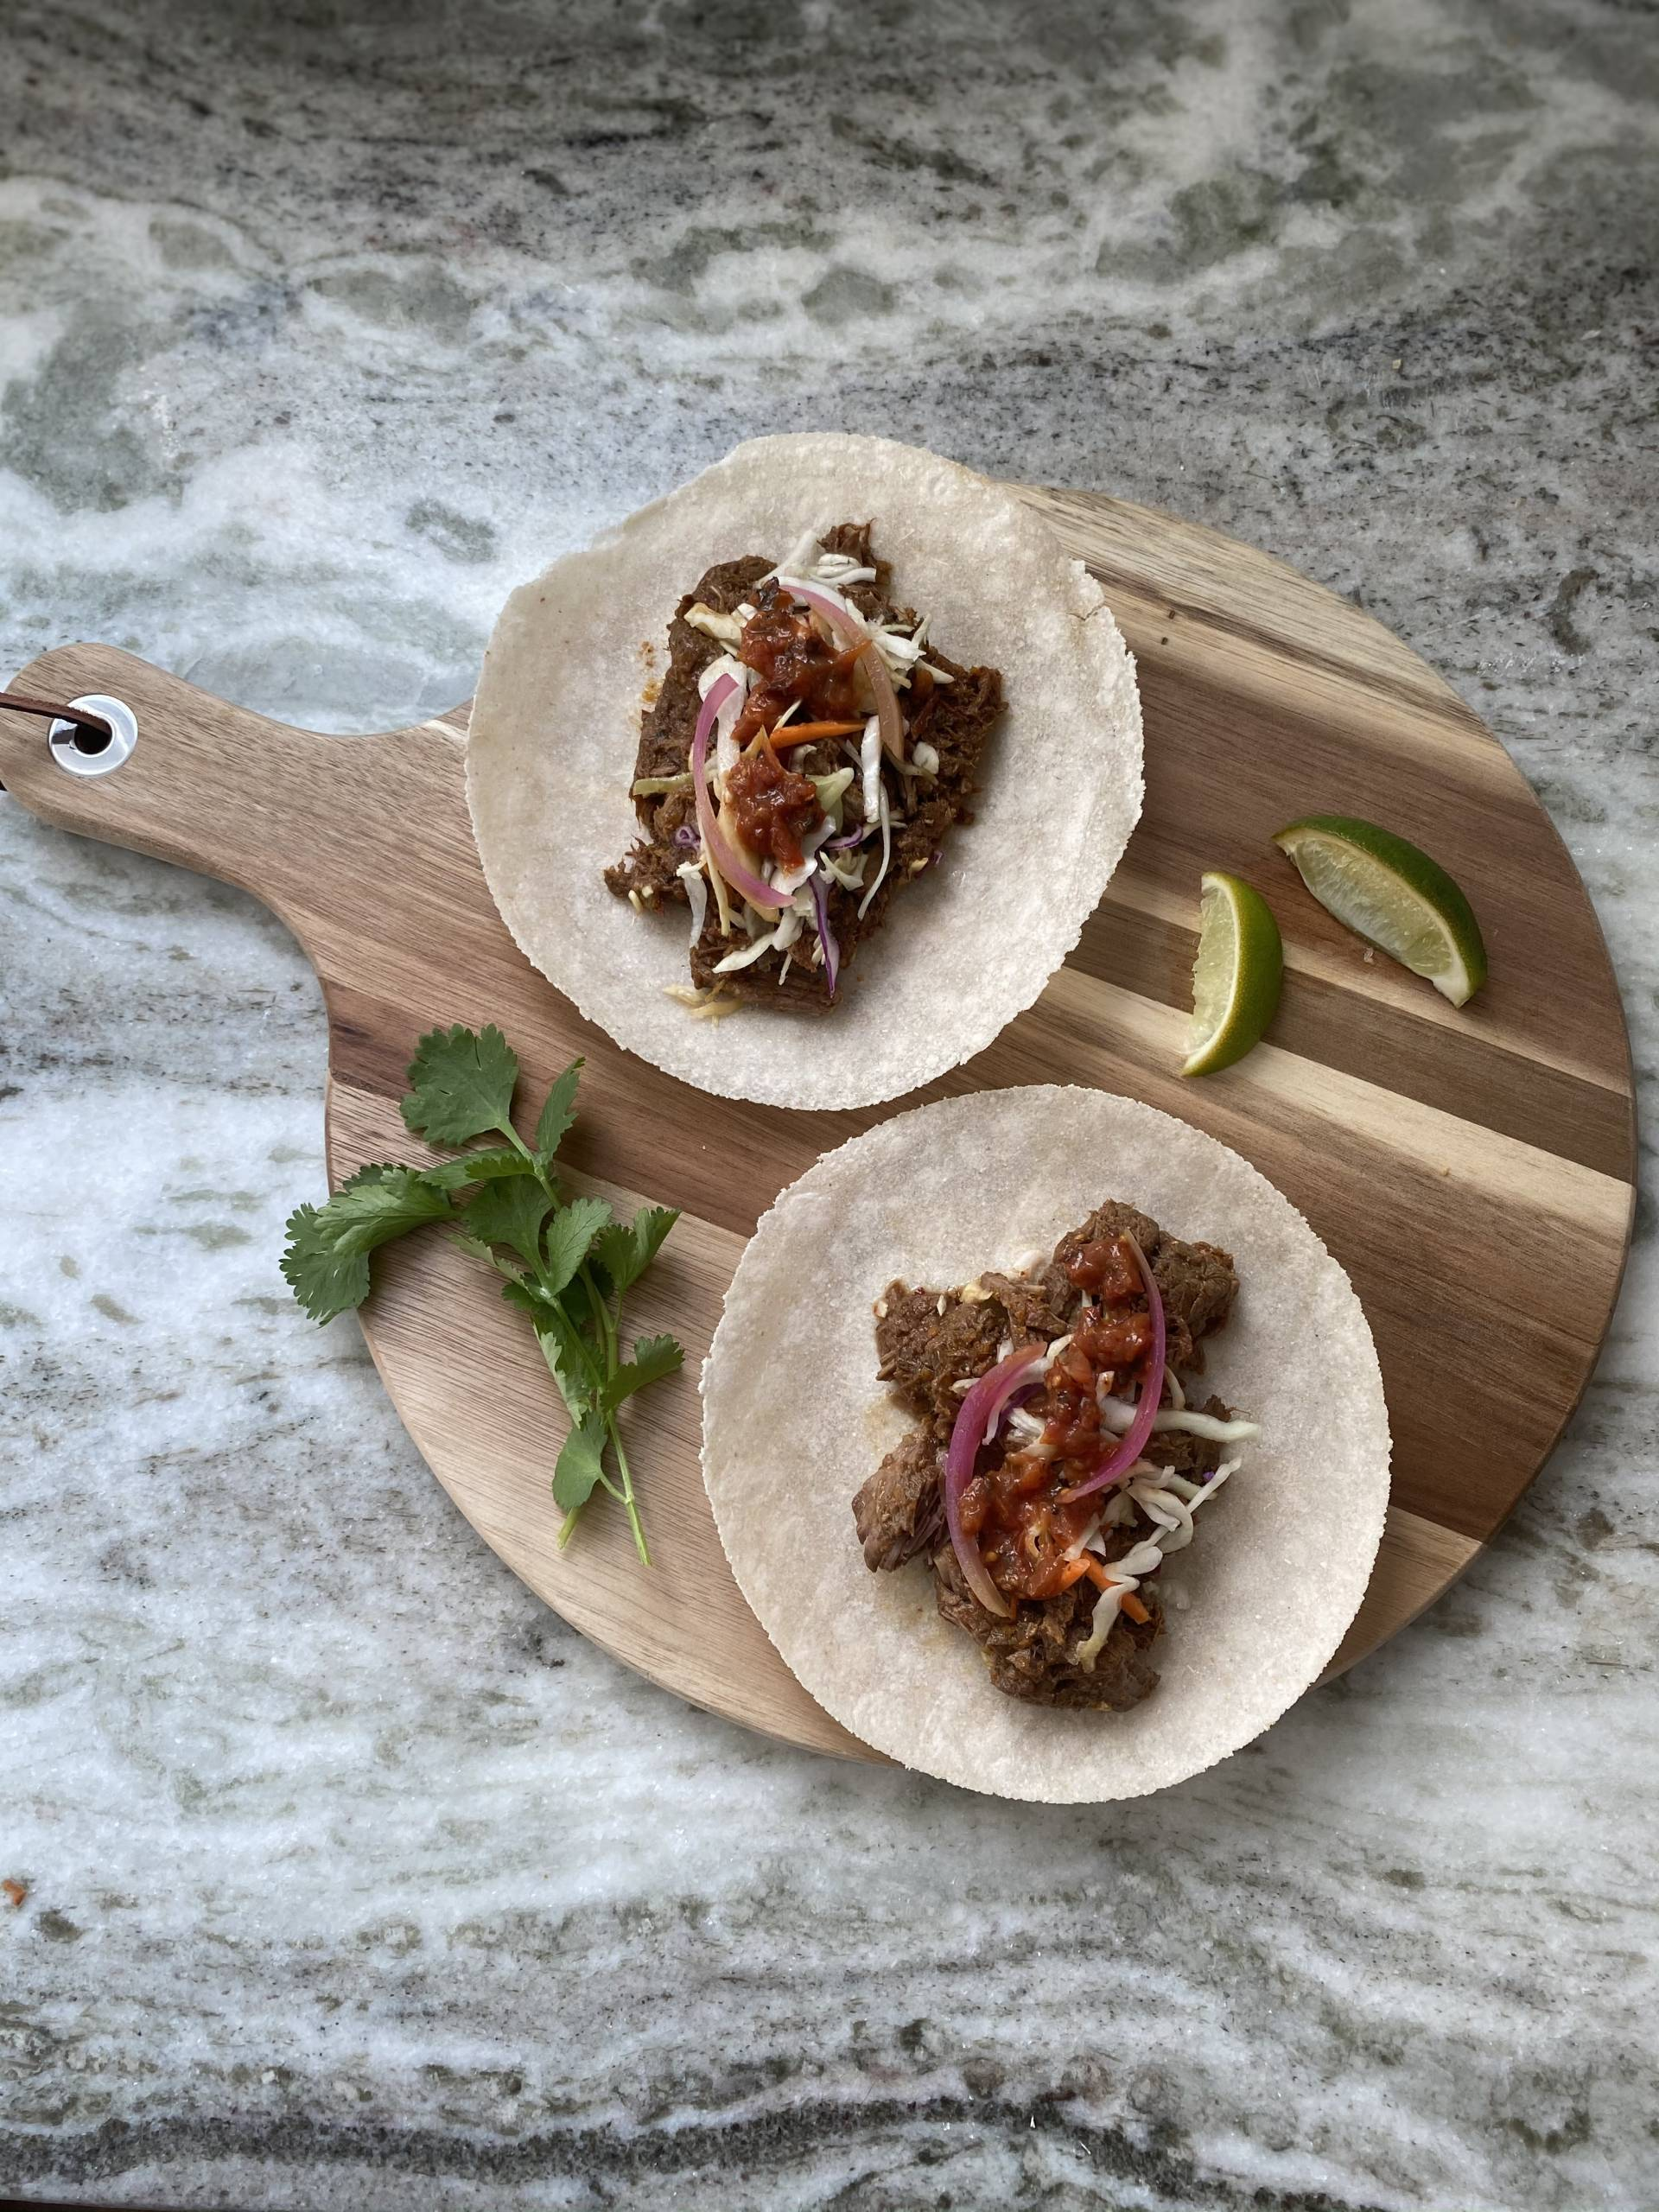 Tacos - Braised Beef